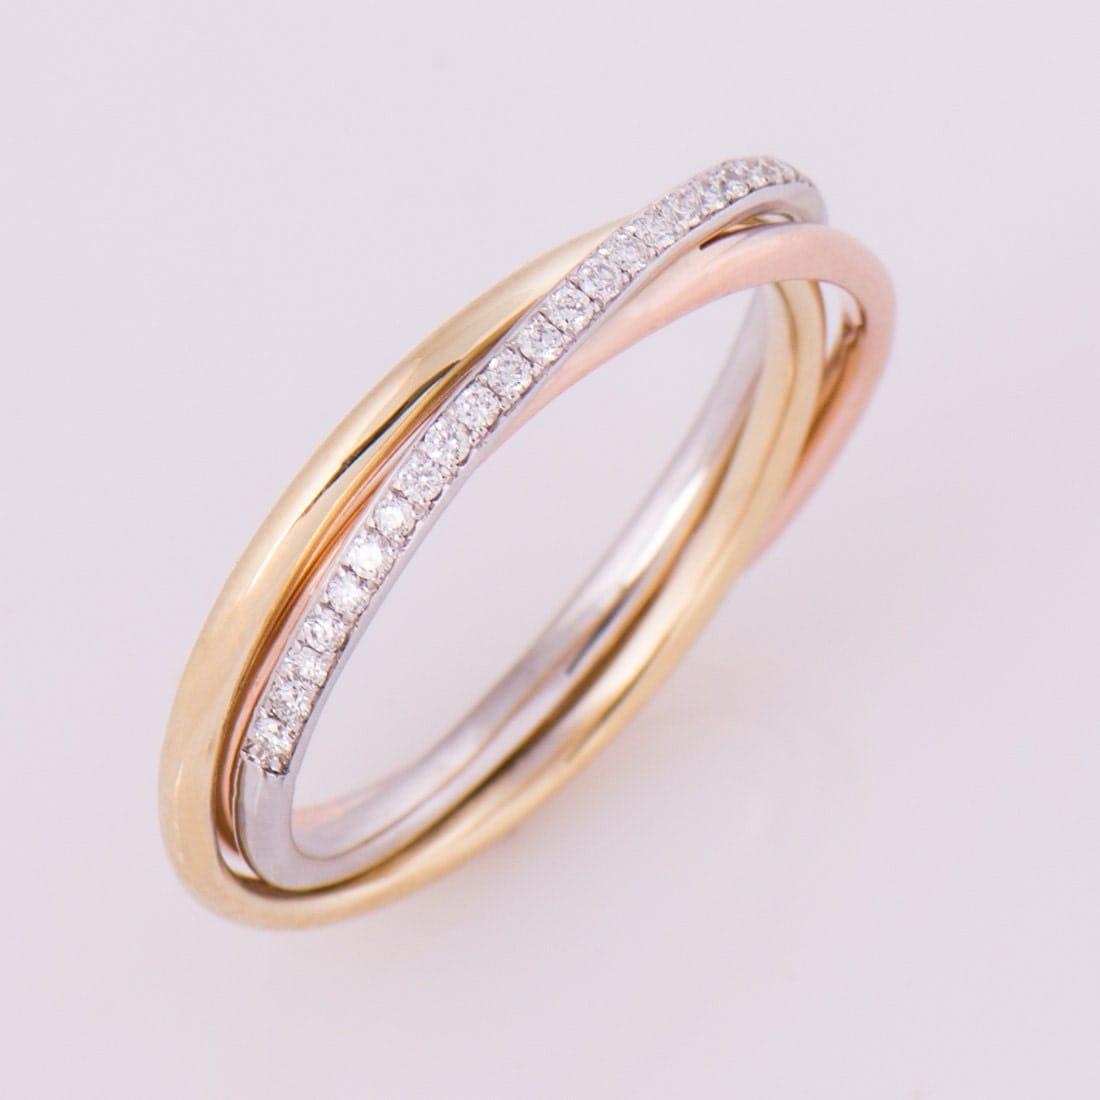 three tone ring 14k 18k gold diamonds band anniversary ring wedding ring - Three Band Wedding Ring